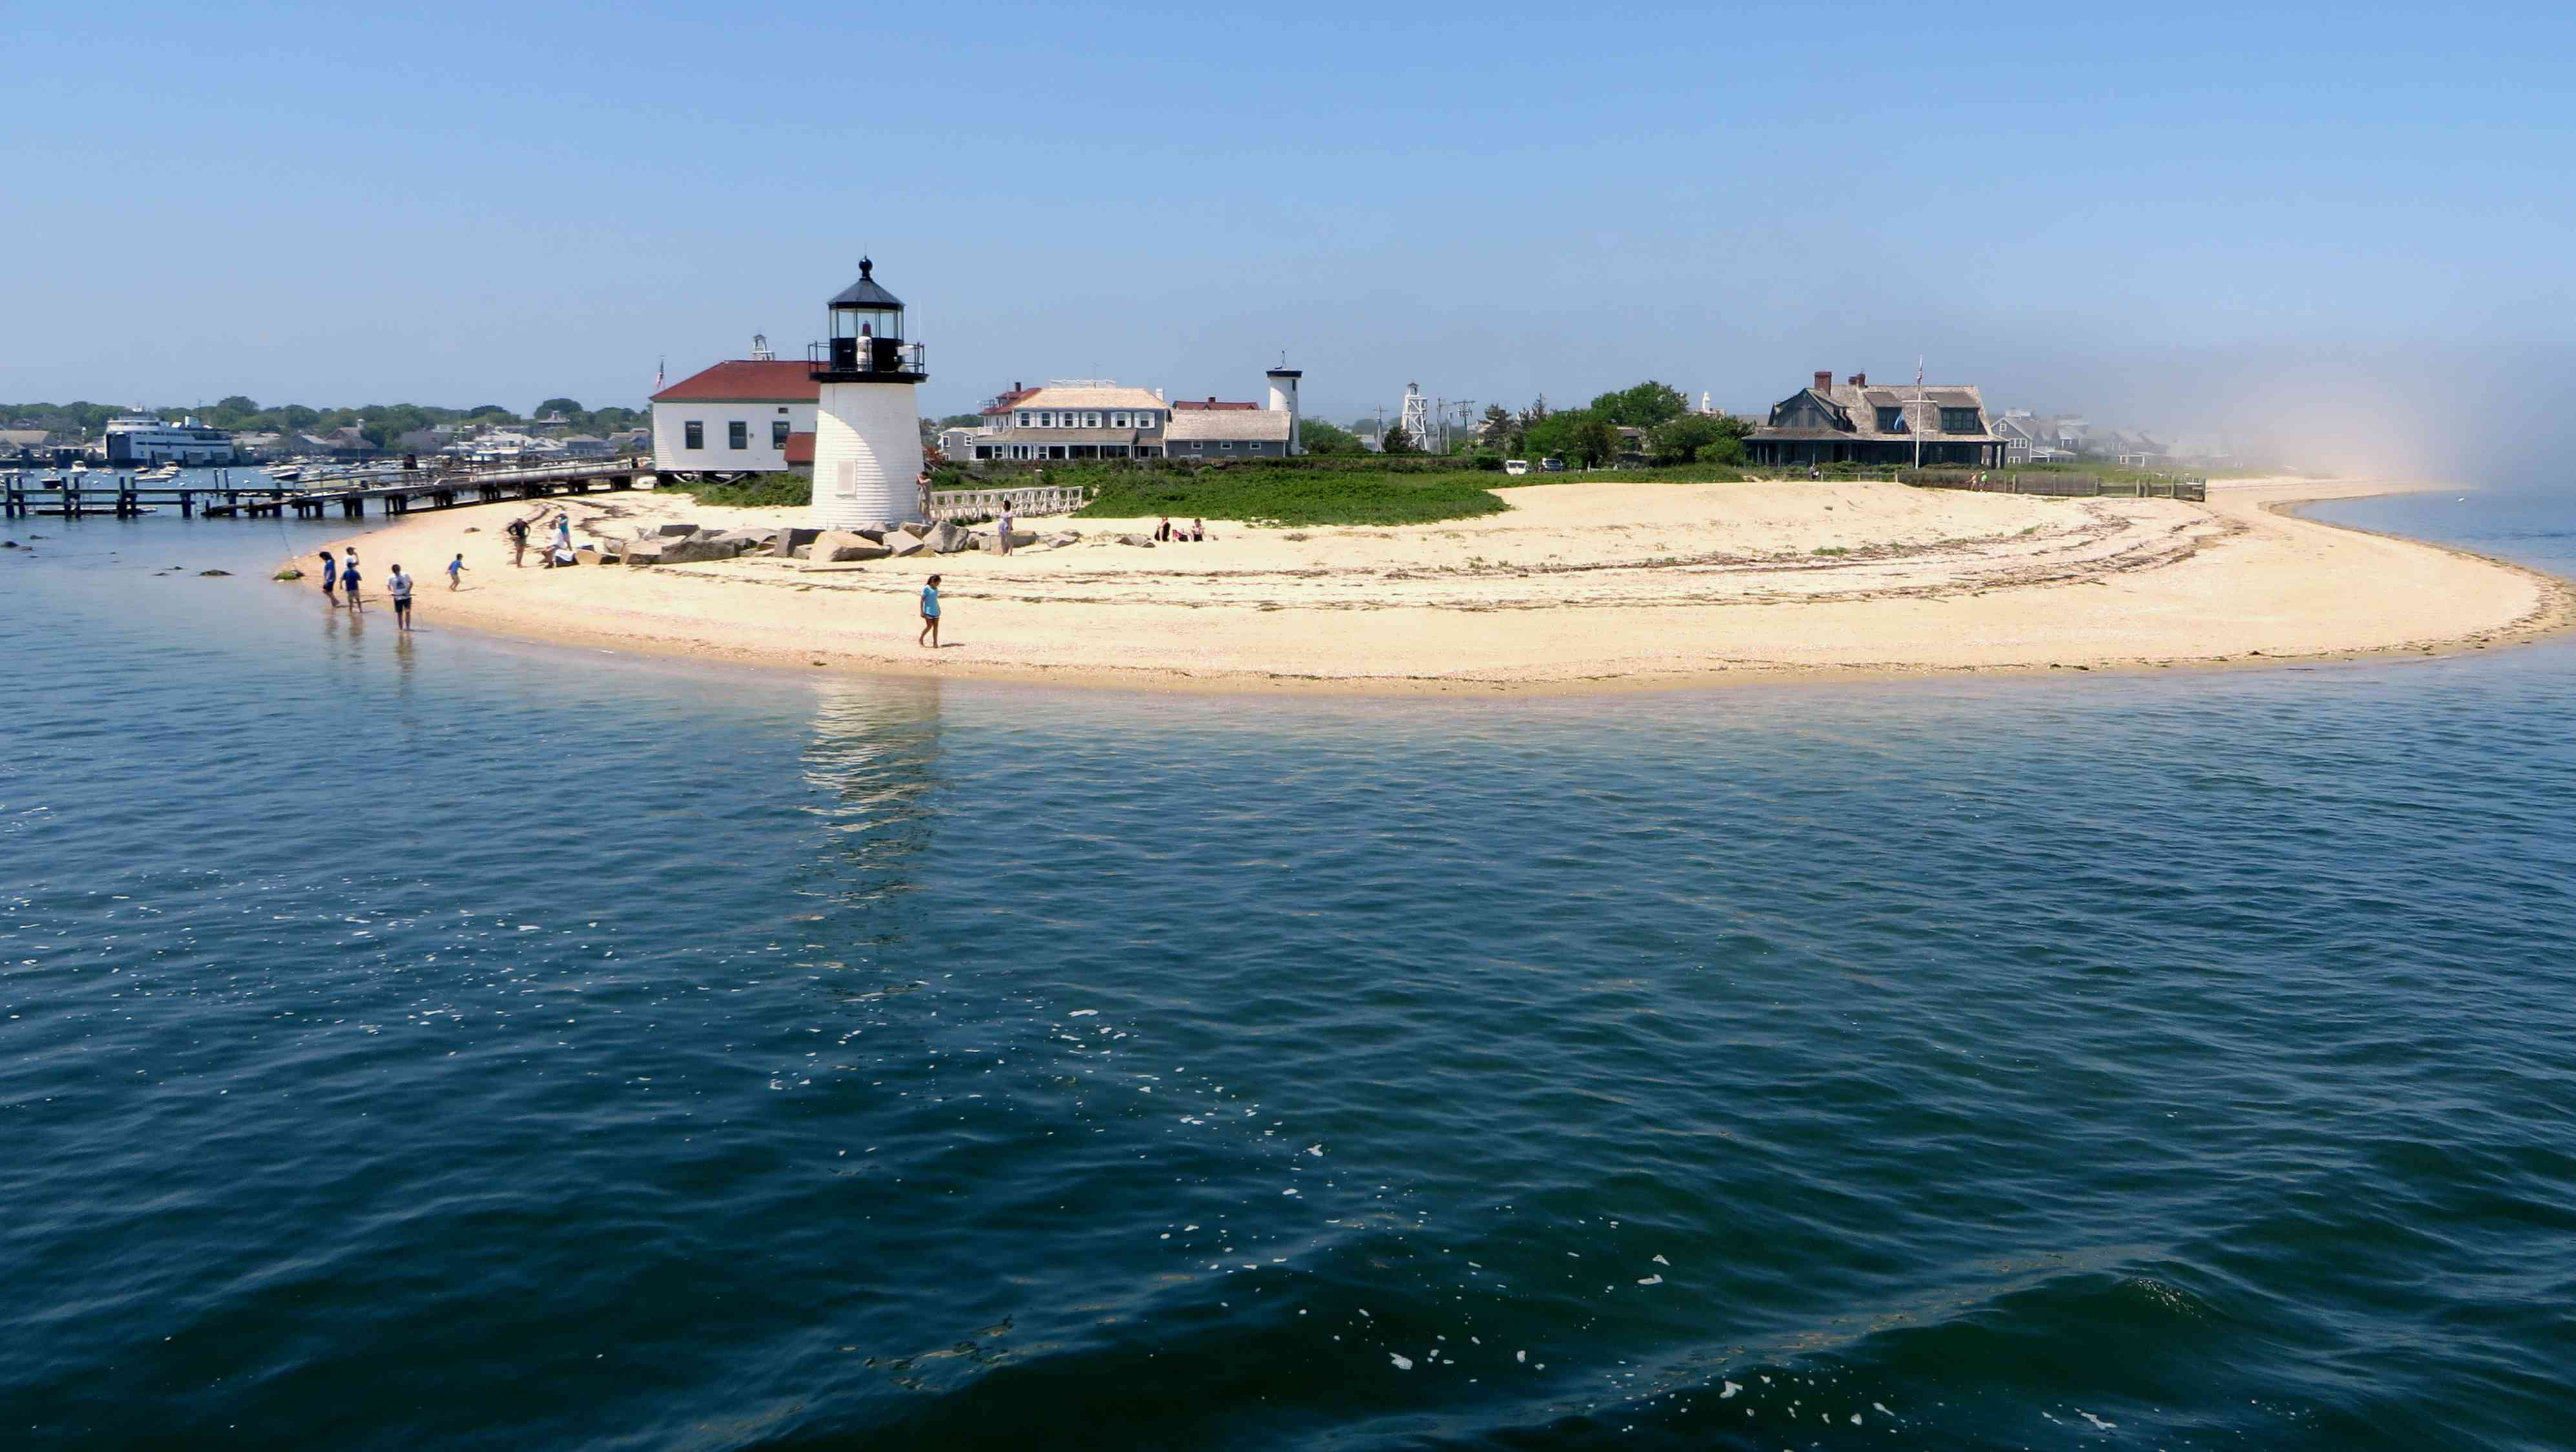 Nantucket, Cape Cod, Massachusetts